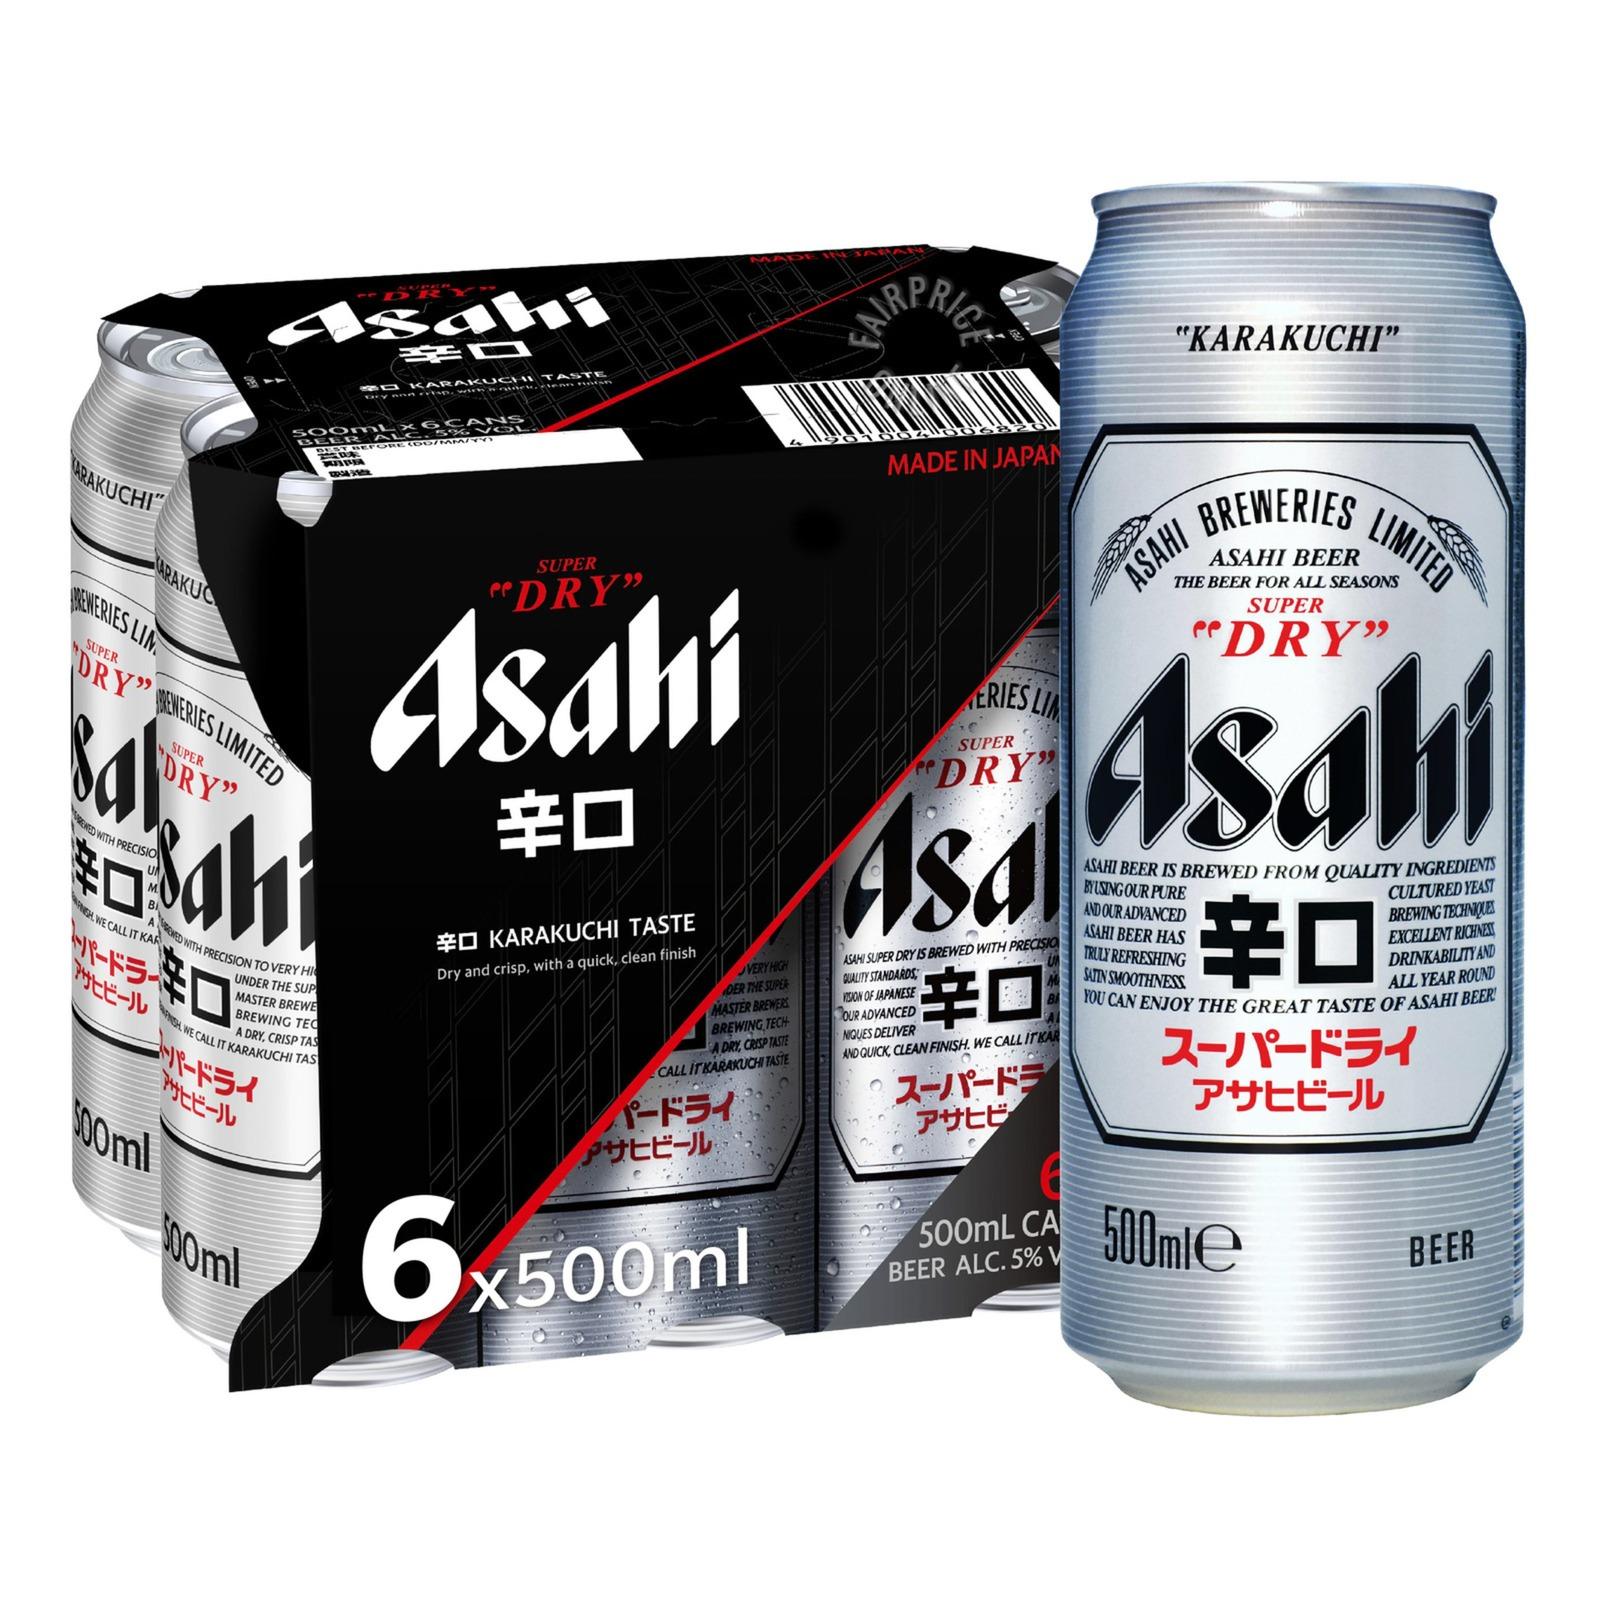 ASAHI Super Dry Draft Beer 6sX500ml